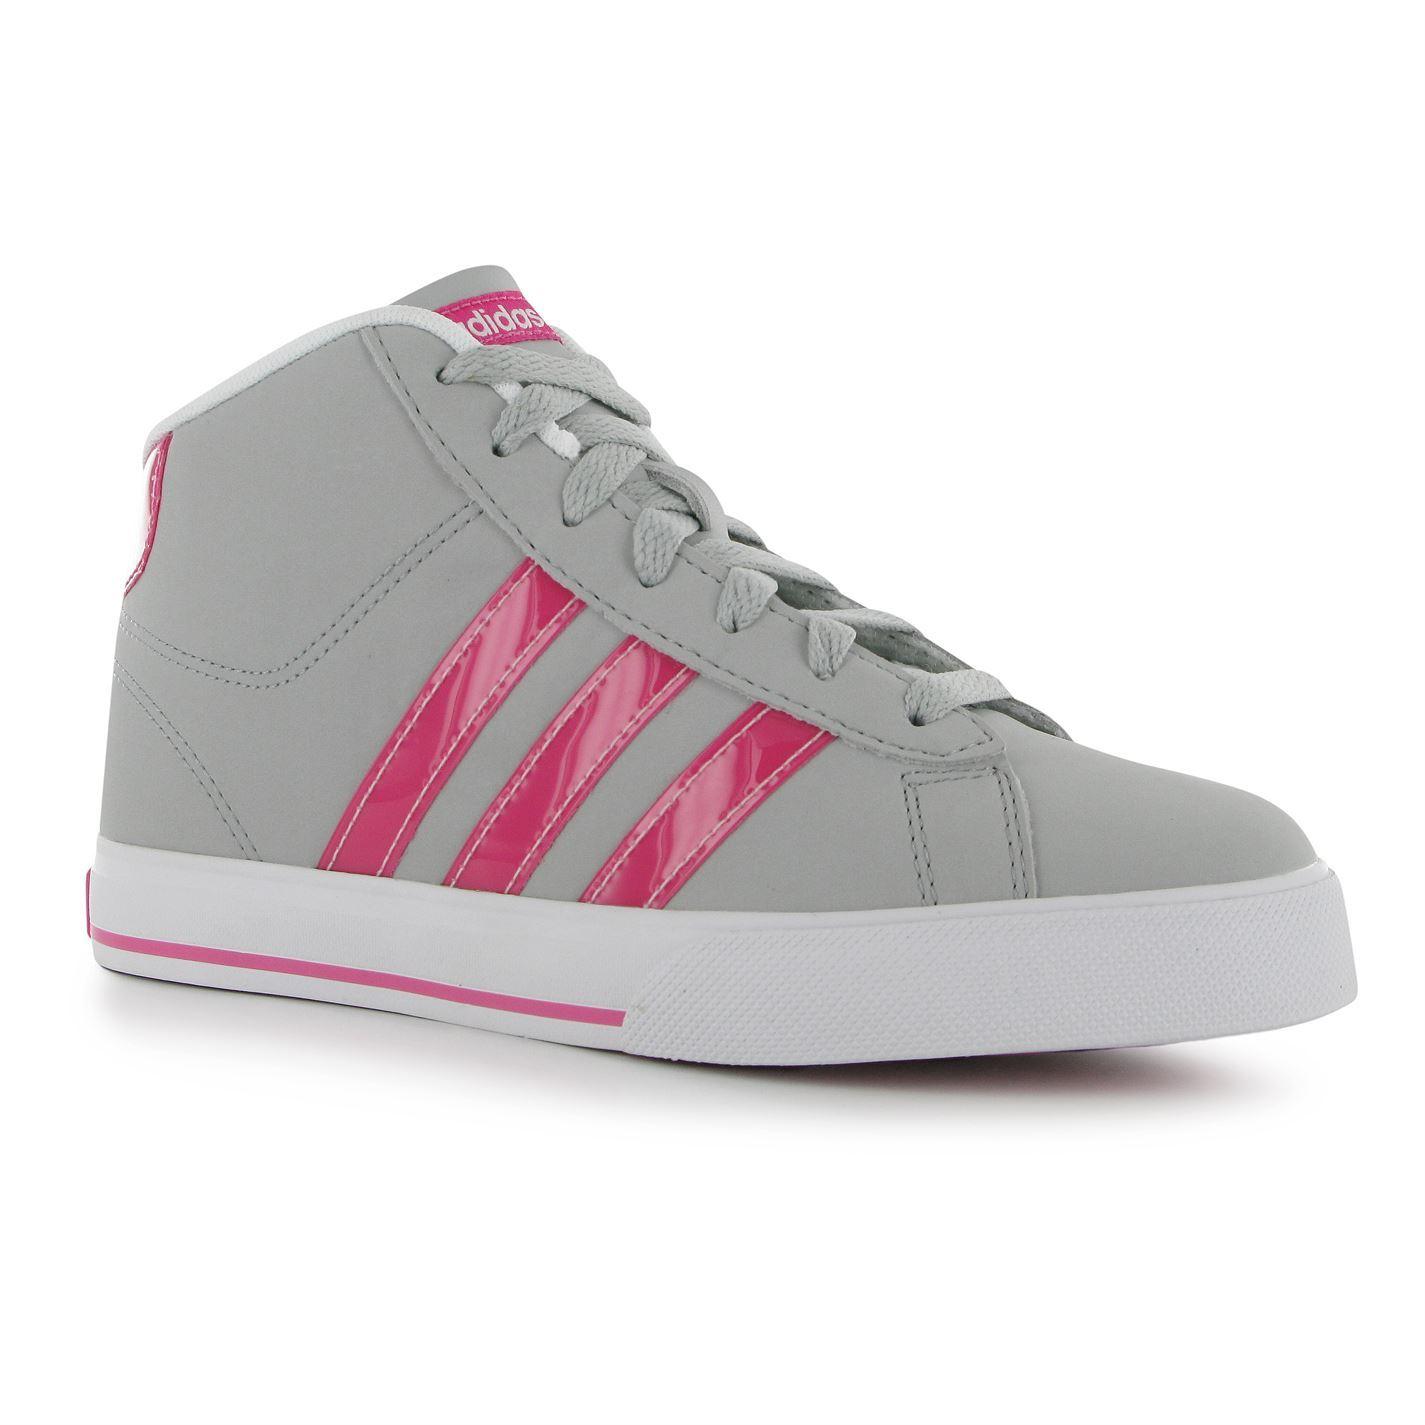 adidas girls trainers 1.5